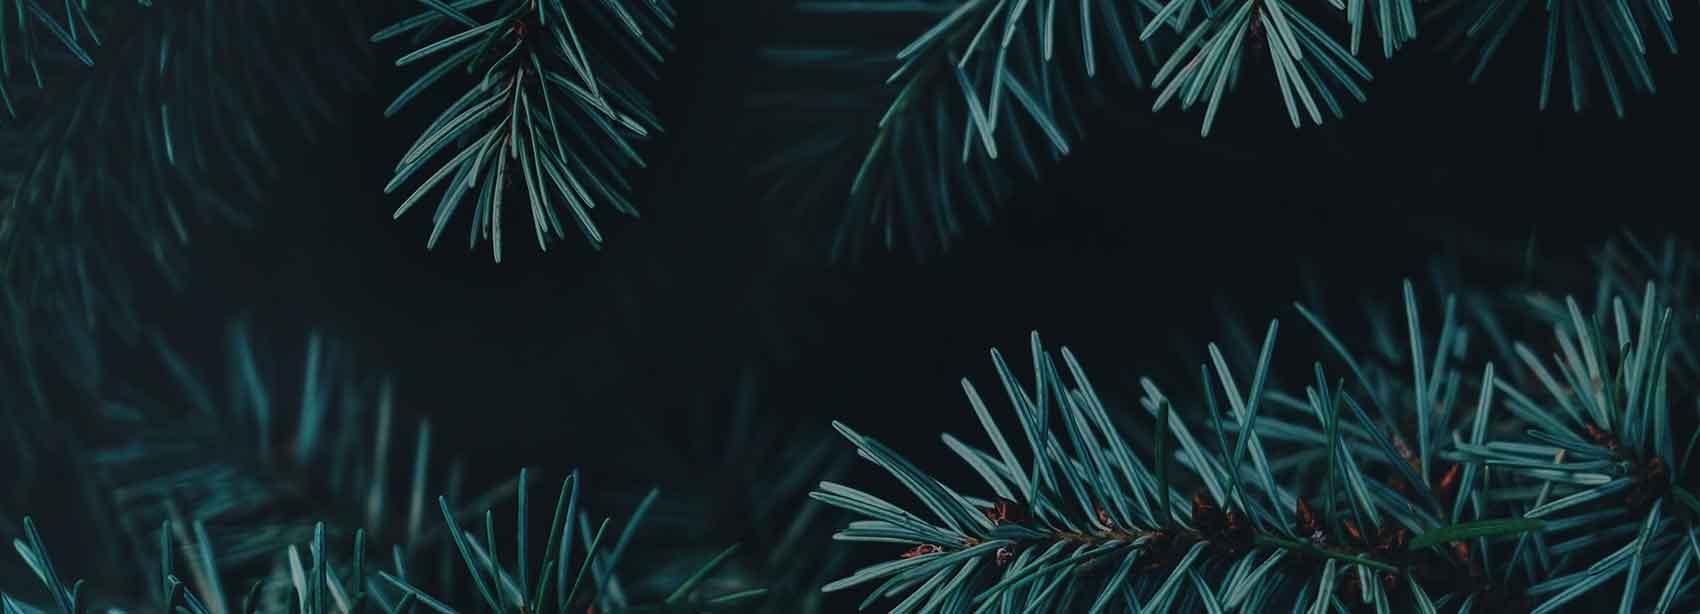 Cabecera-navidad-opt